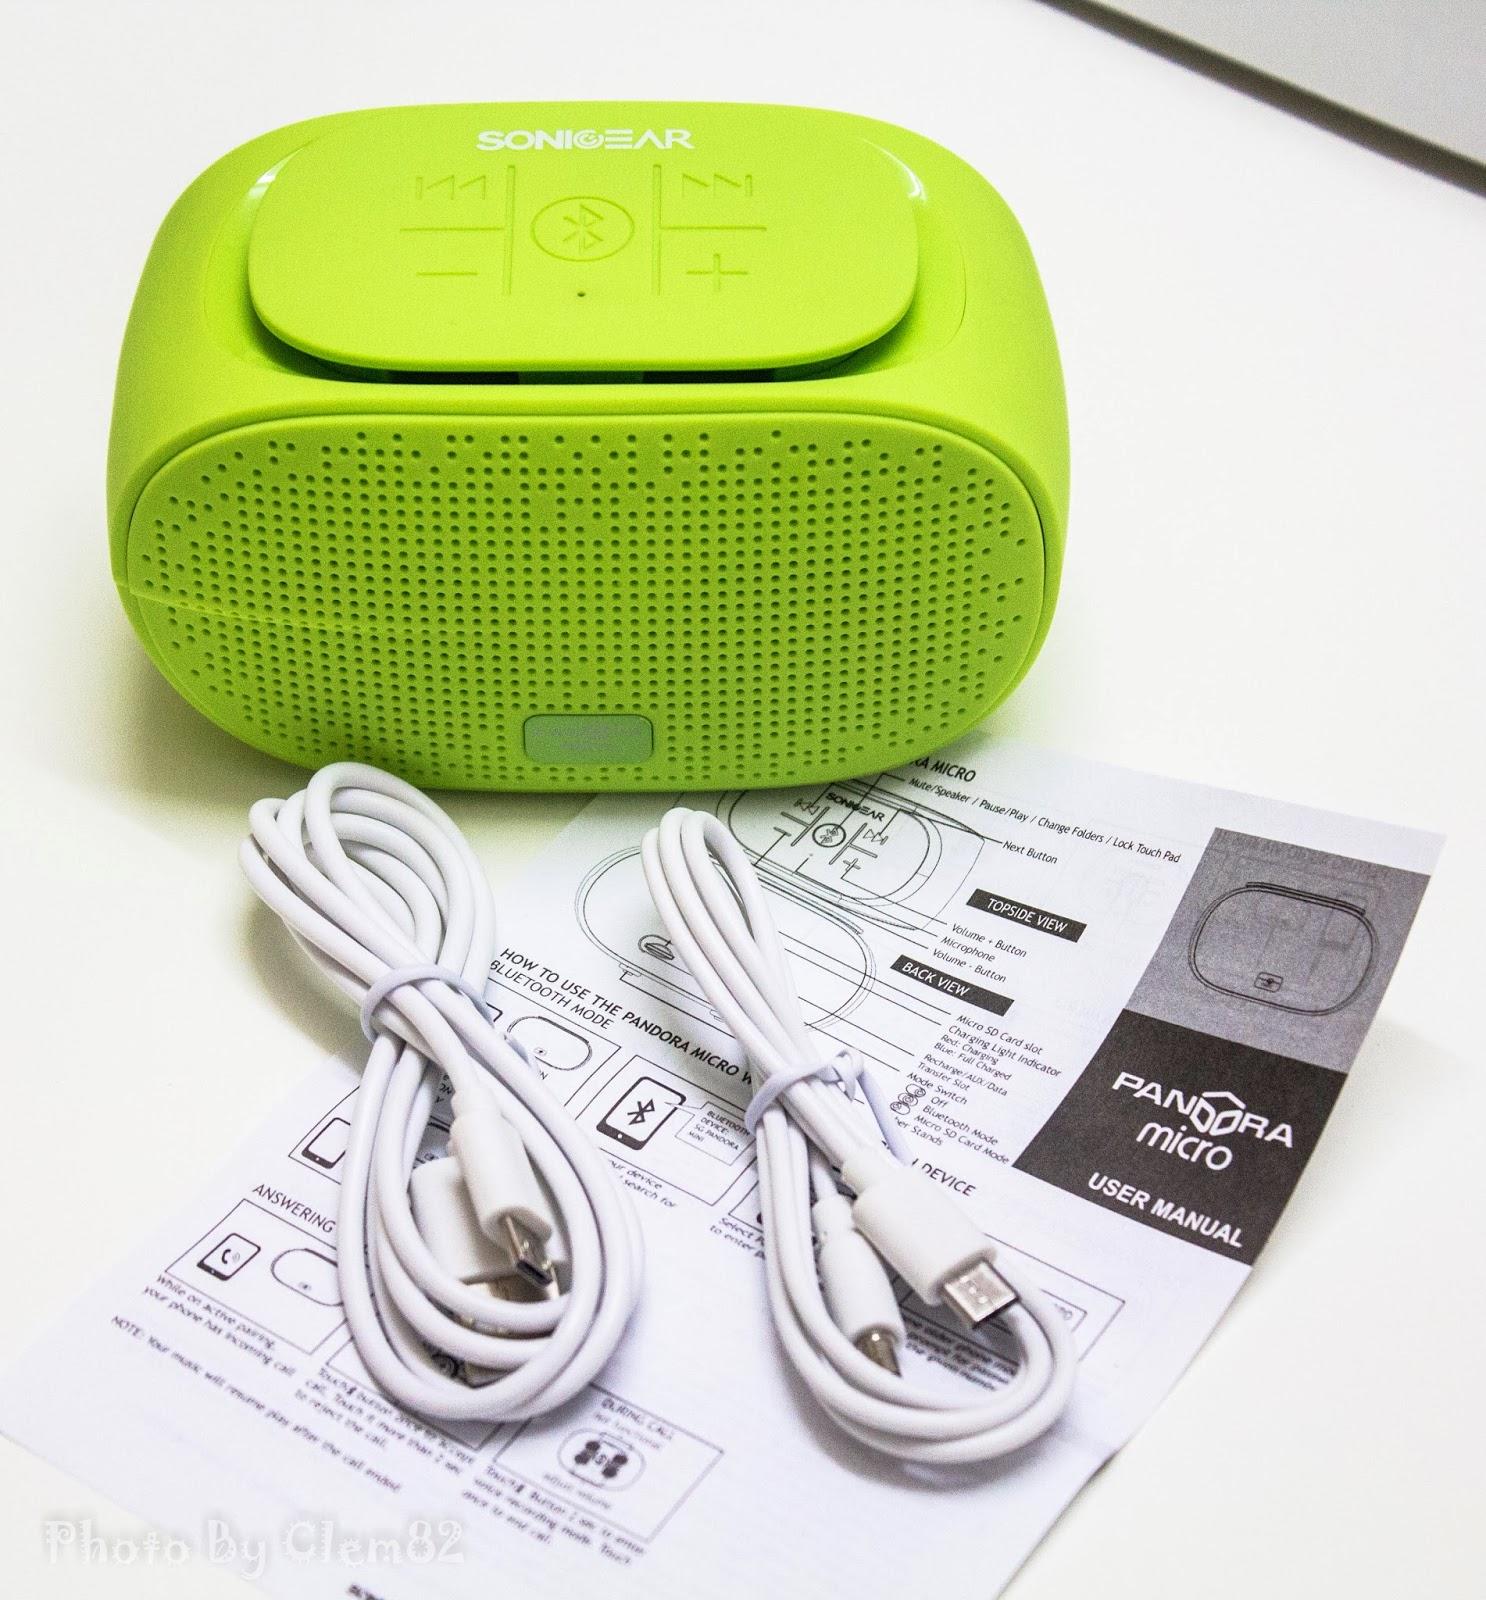 Opening Pandora's Box: SonicGear Pandora Wireless Bluetooth Media Player Series 5